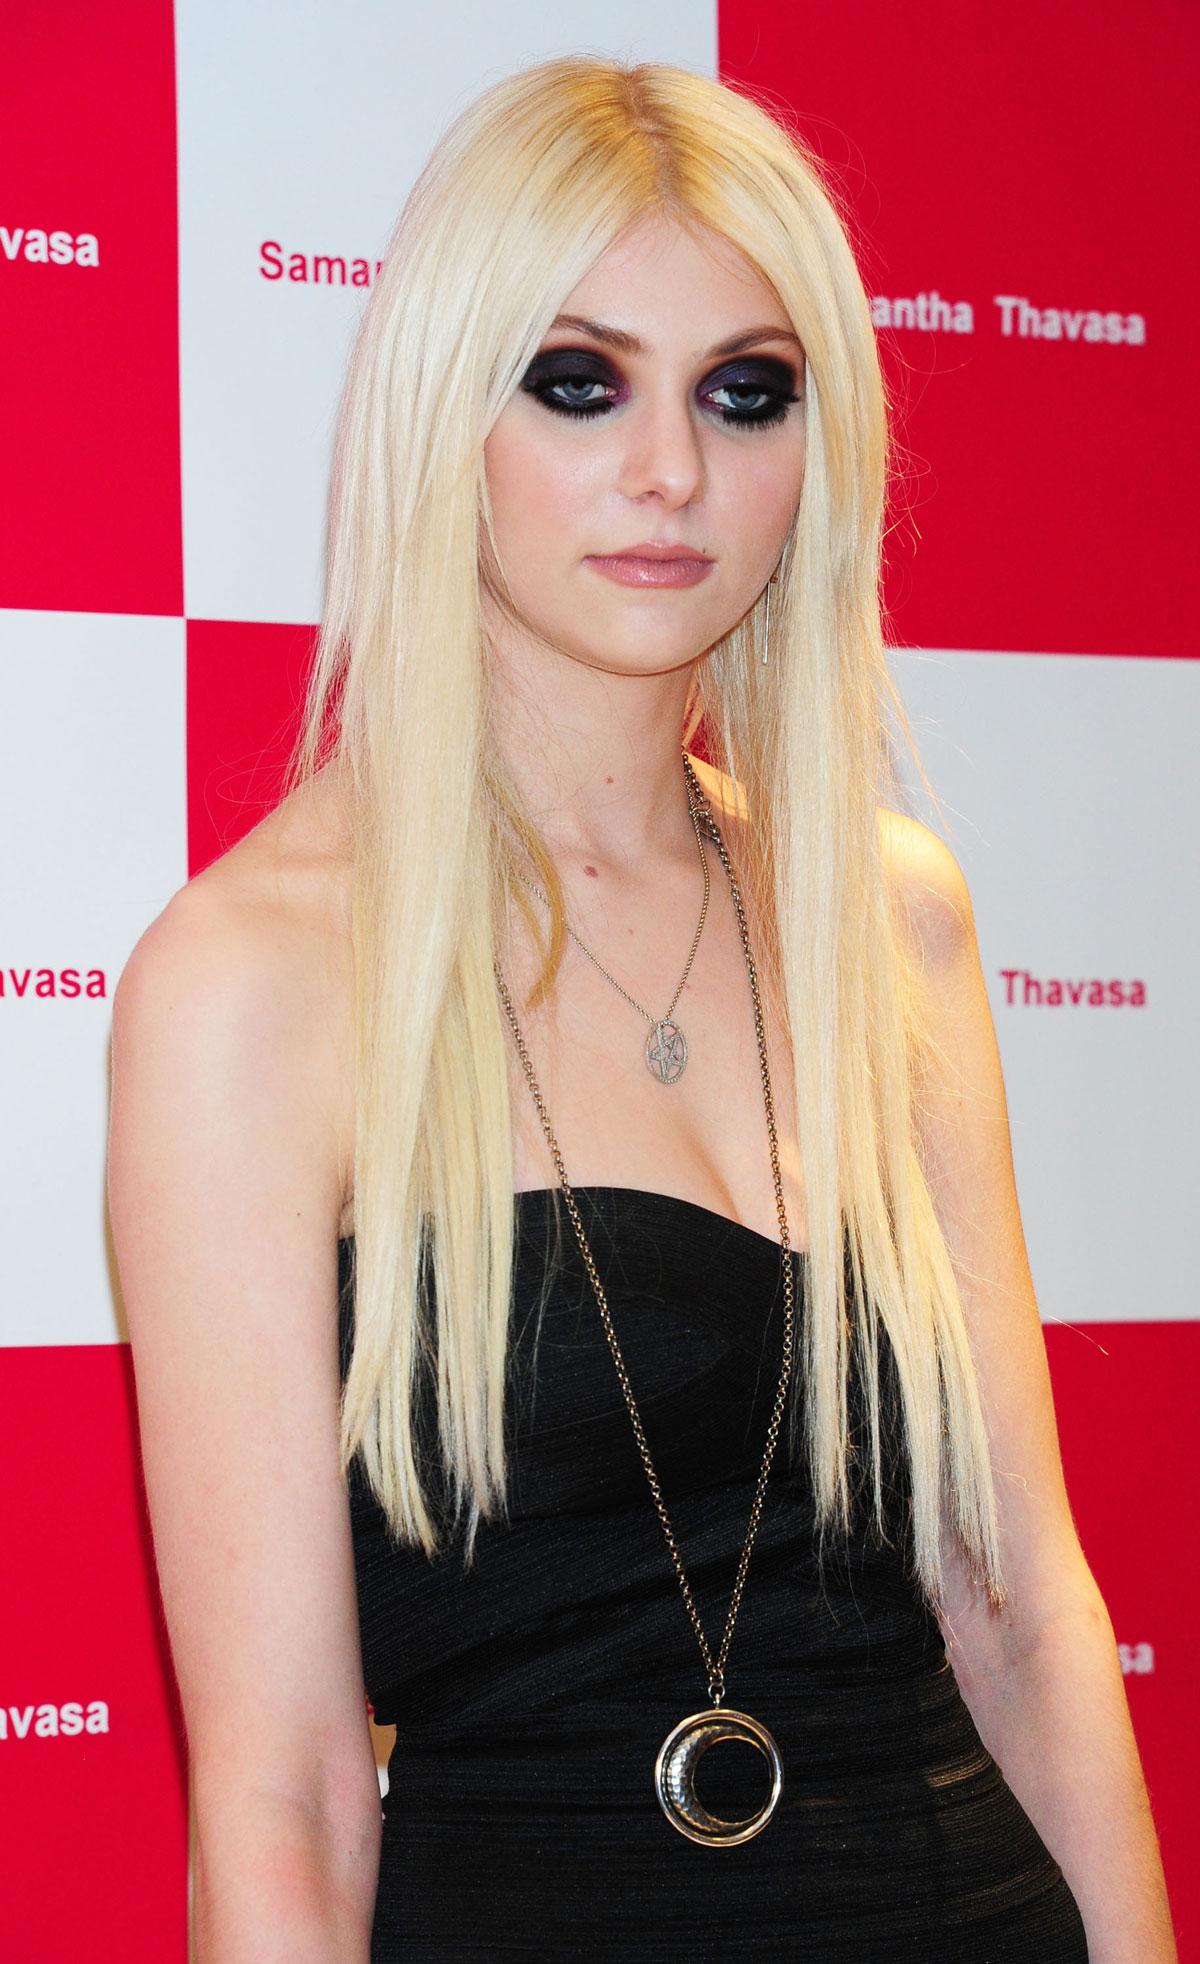 Taylor Momsen At Samantha Thavasa Event In Tokyo Hawtcelebs